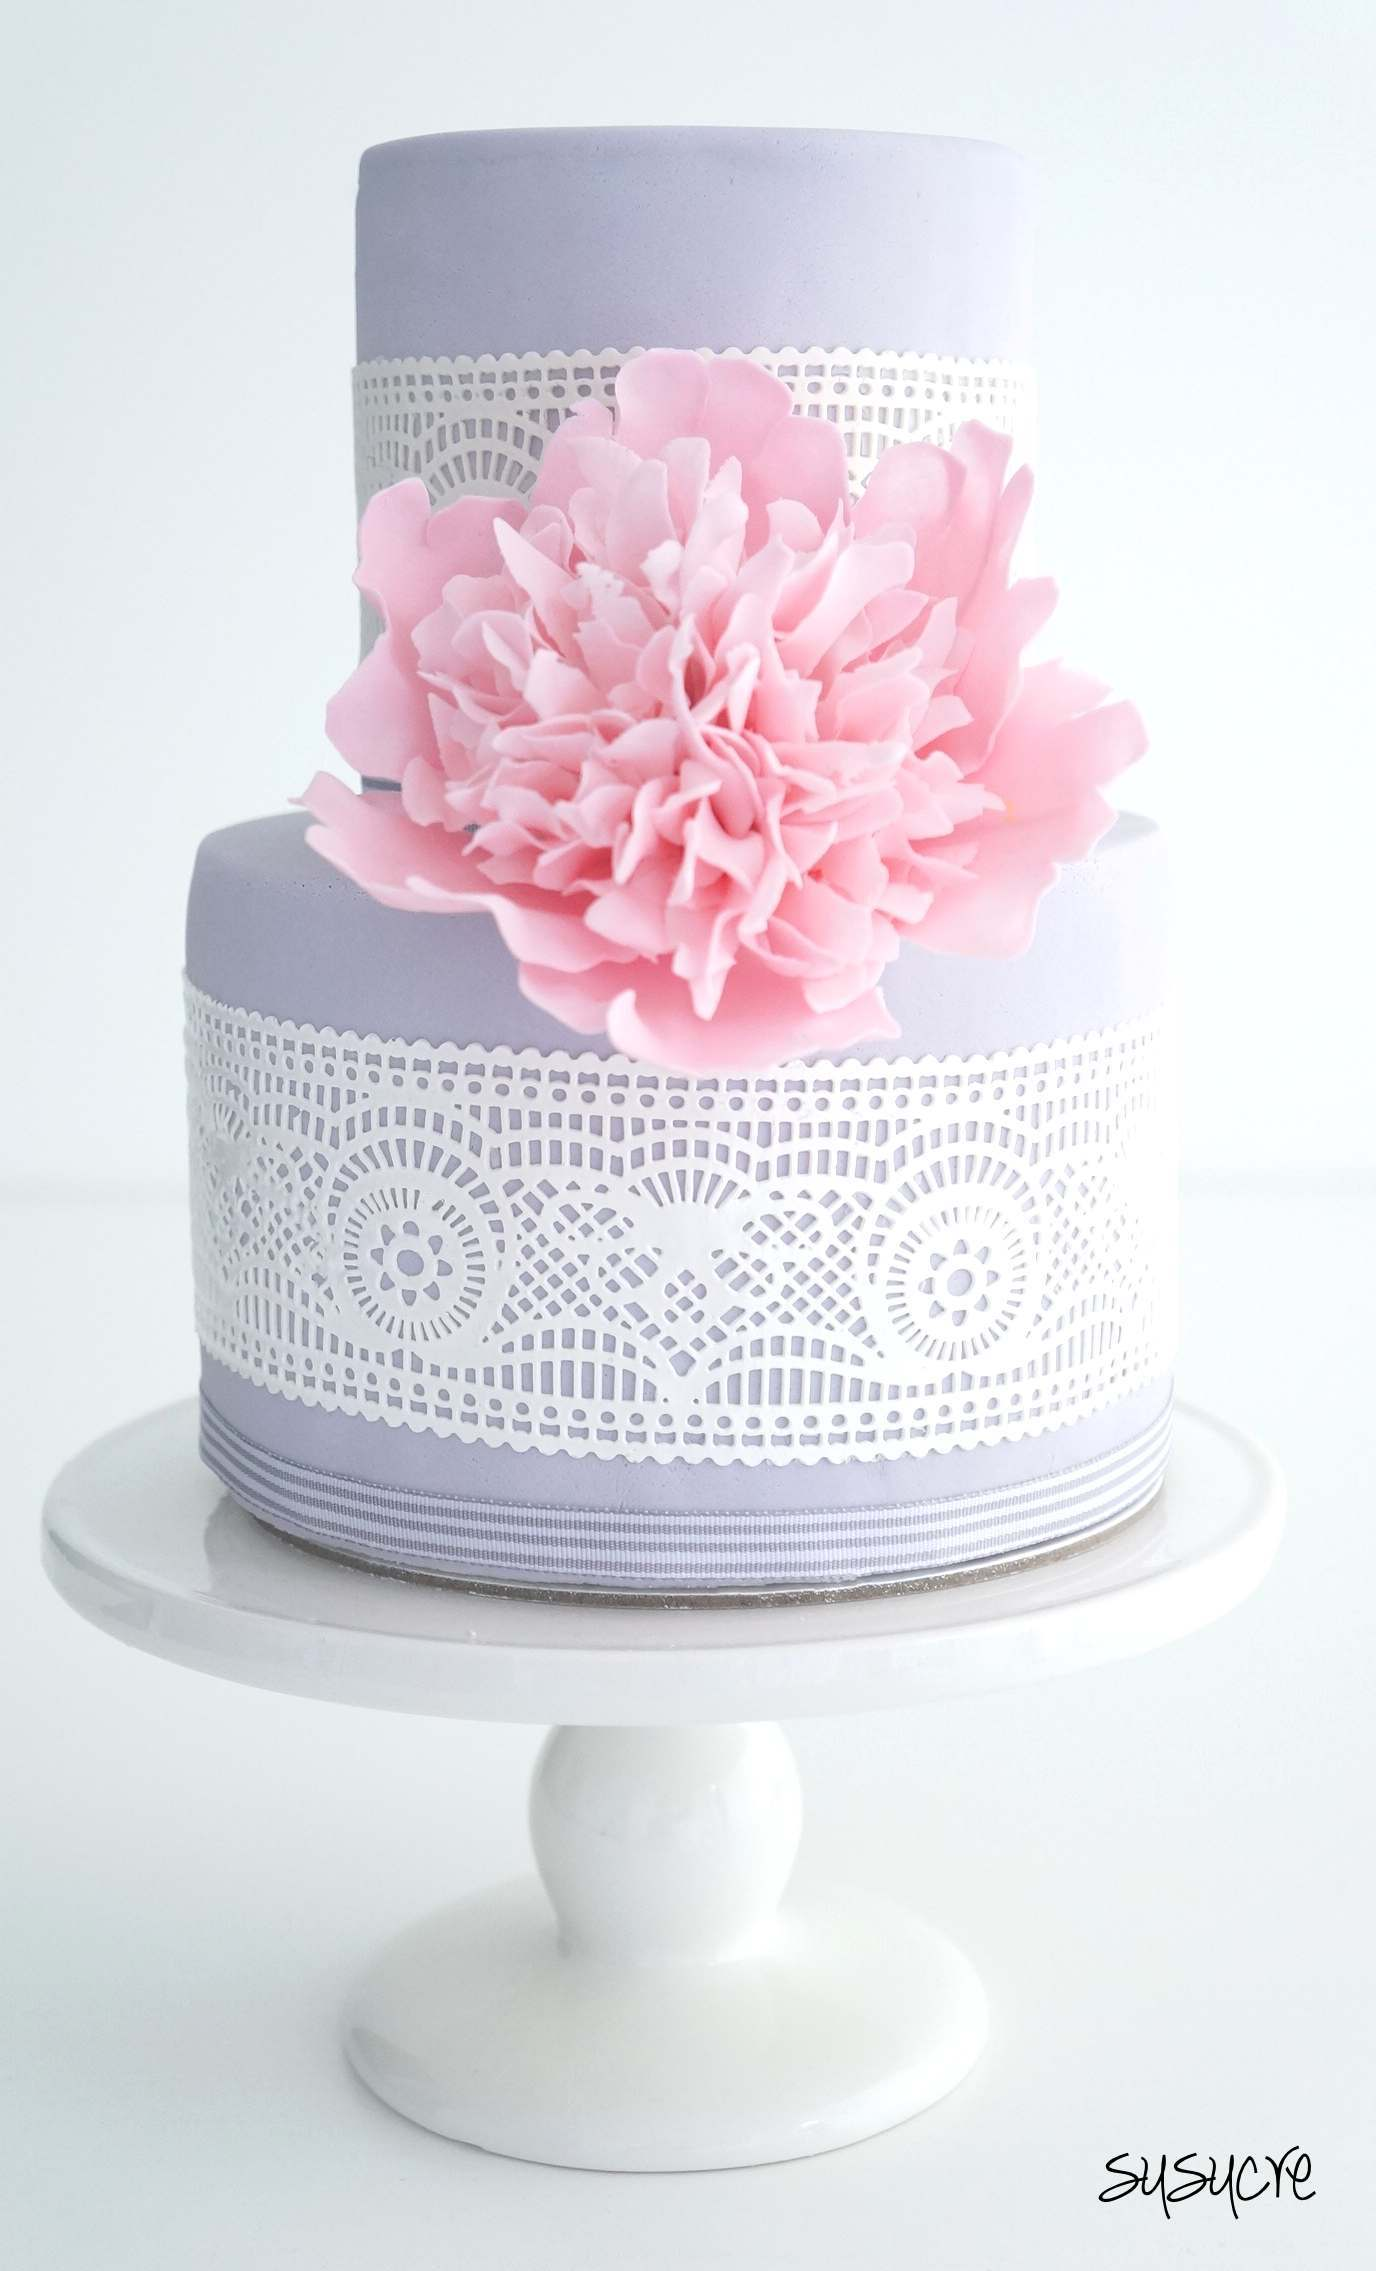 Two-Tier Wedding cakes by Susucre Pte Ltd   Bridestory.com